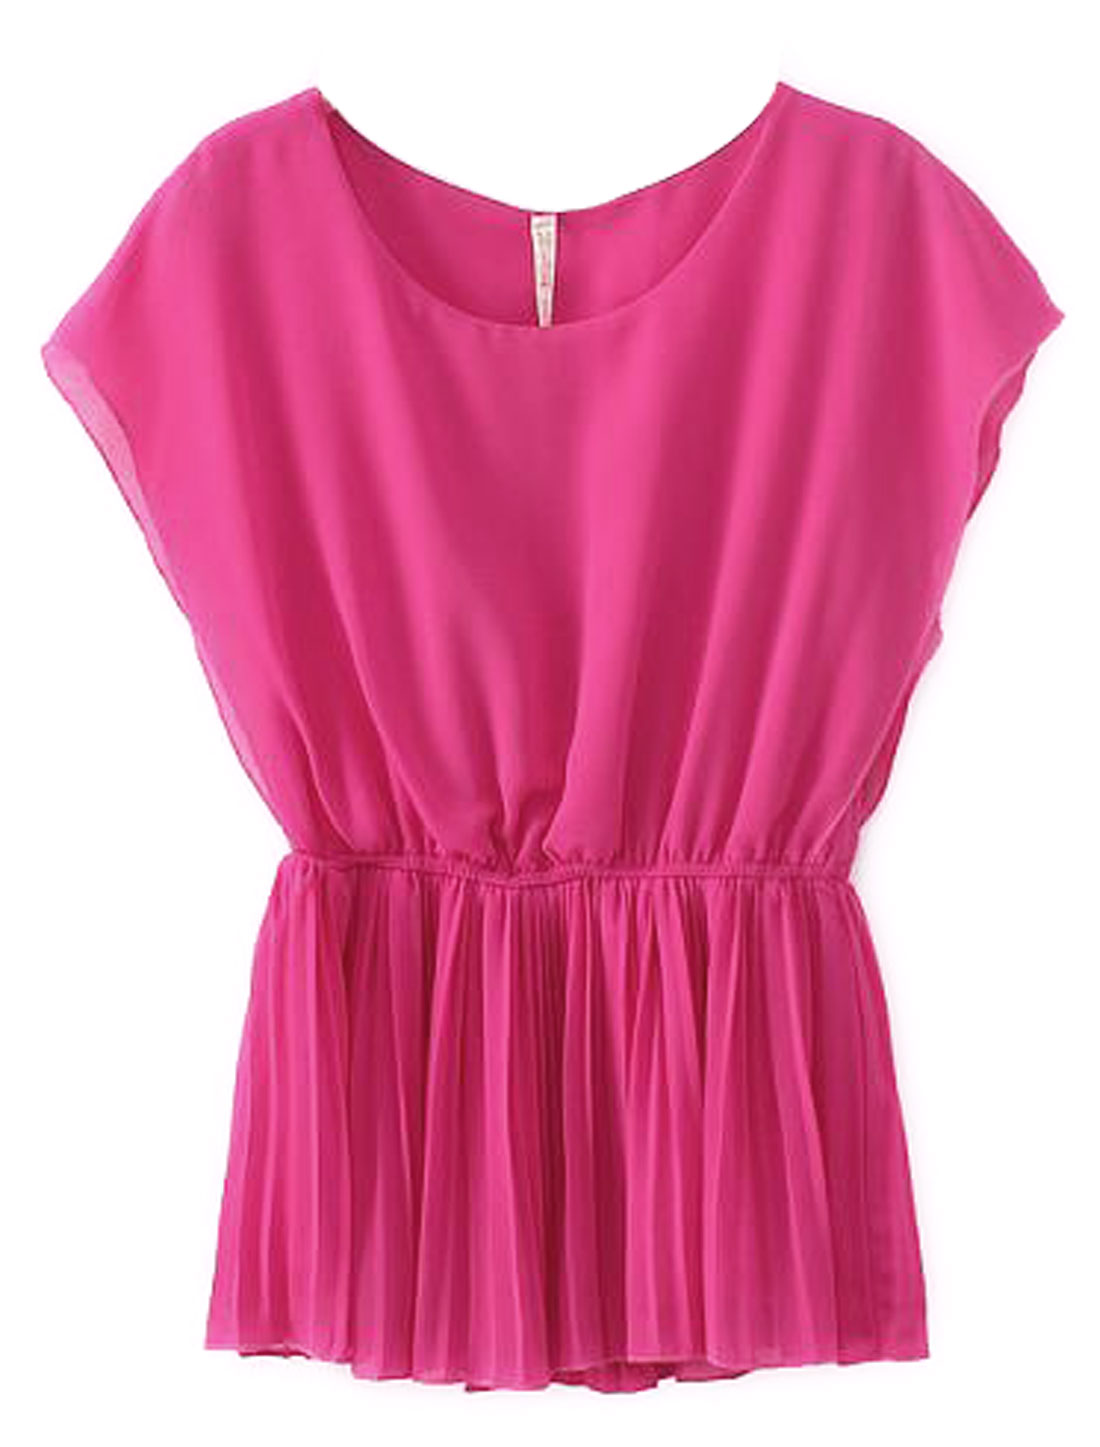 Lady Pullover Sleeveless Elastic Waist Pleated Blouse Fuchsia XS